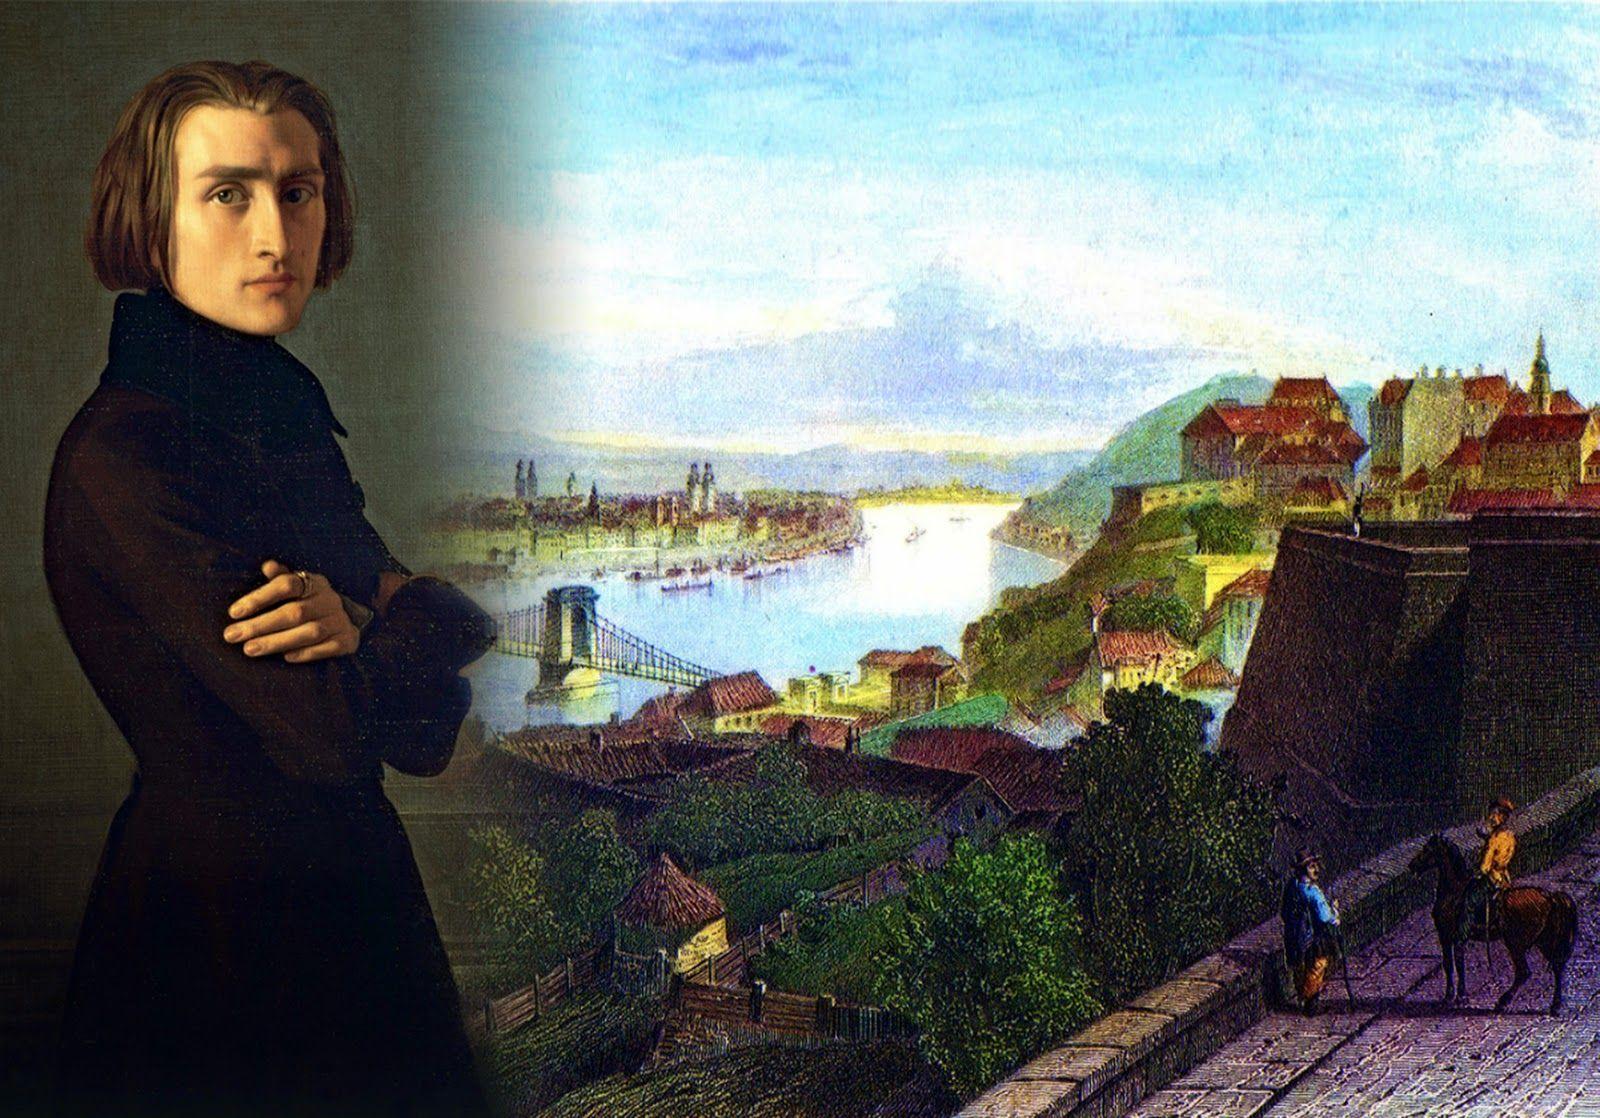 Franz Liszt's Hungarian Rhapsody No.2 (1847)